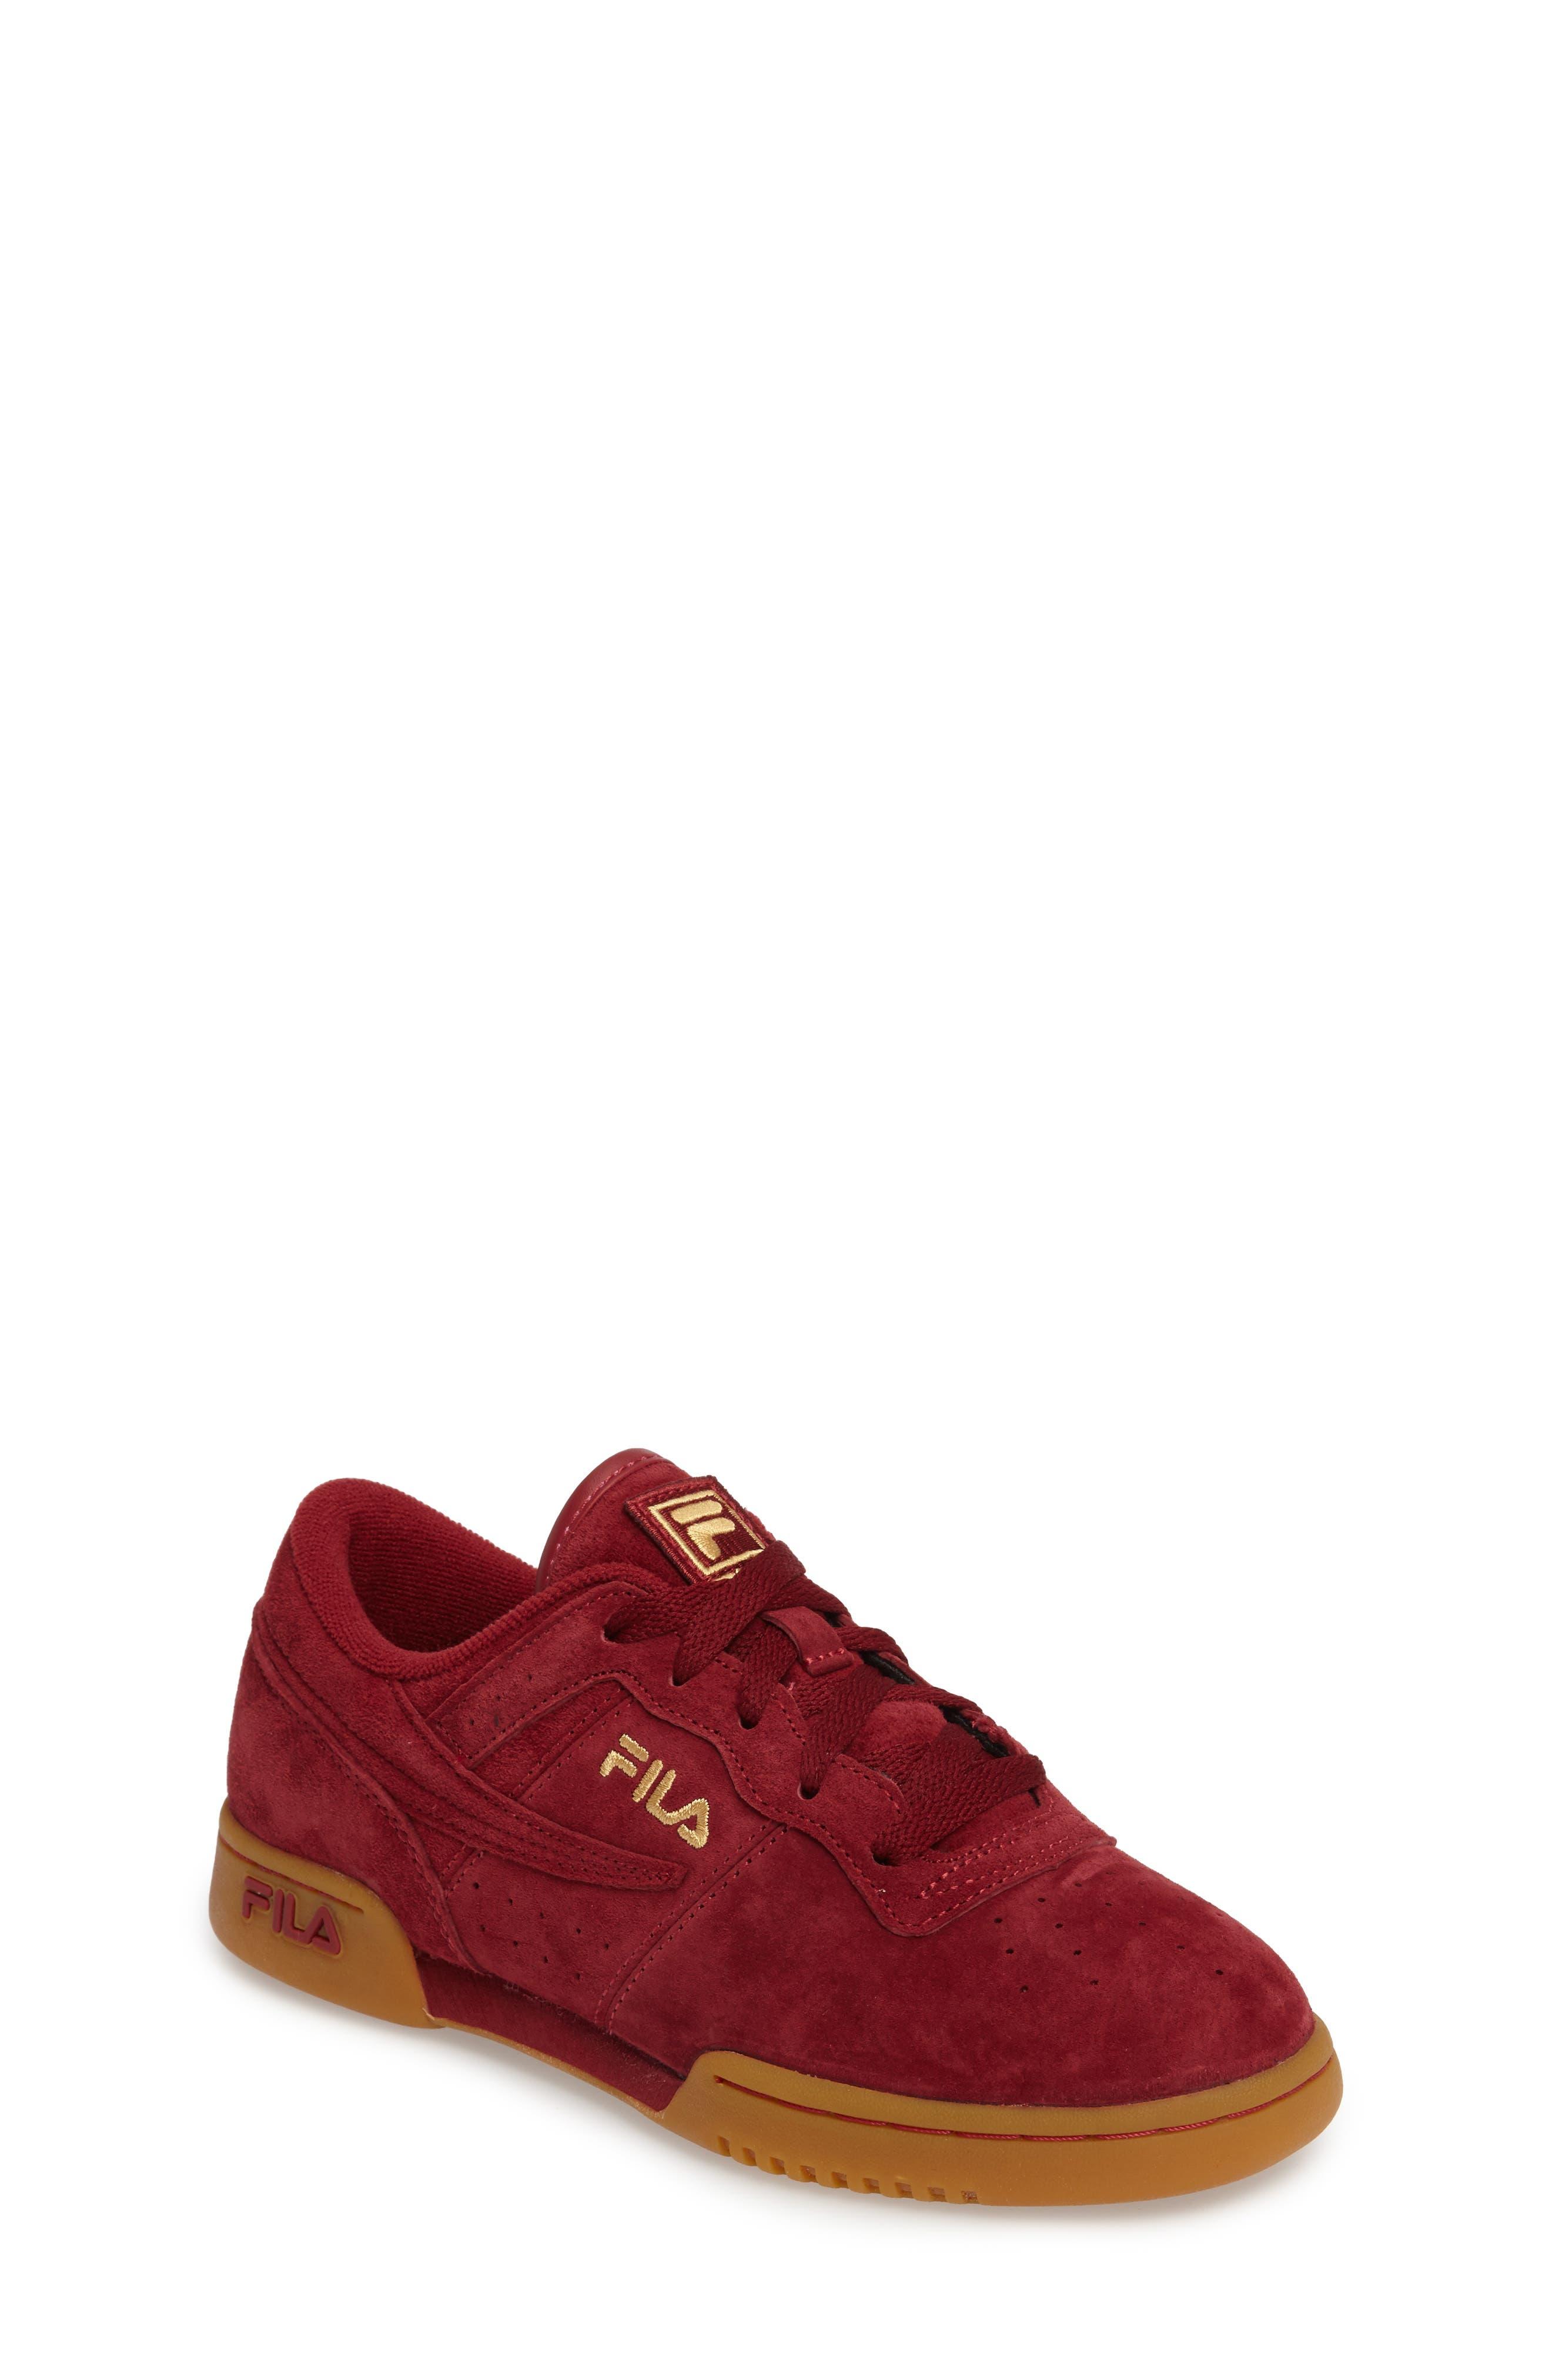 Heritage Sneaker,                         Main,                         color, 600